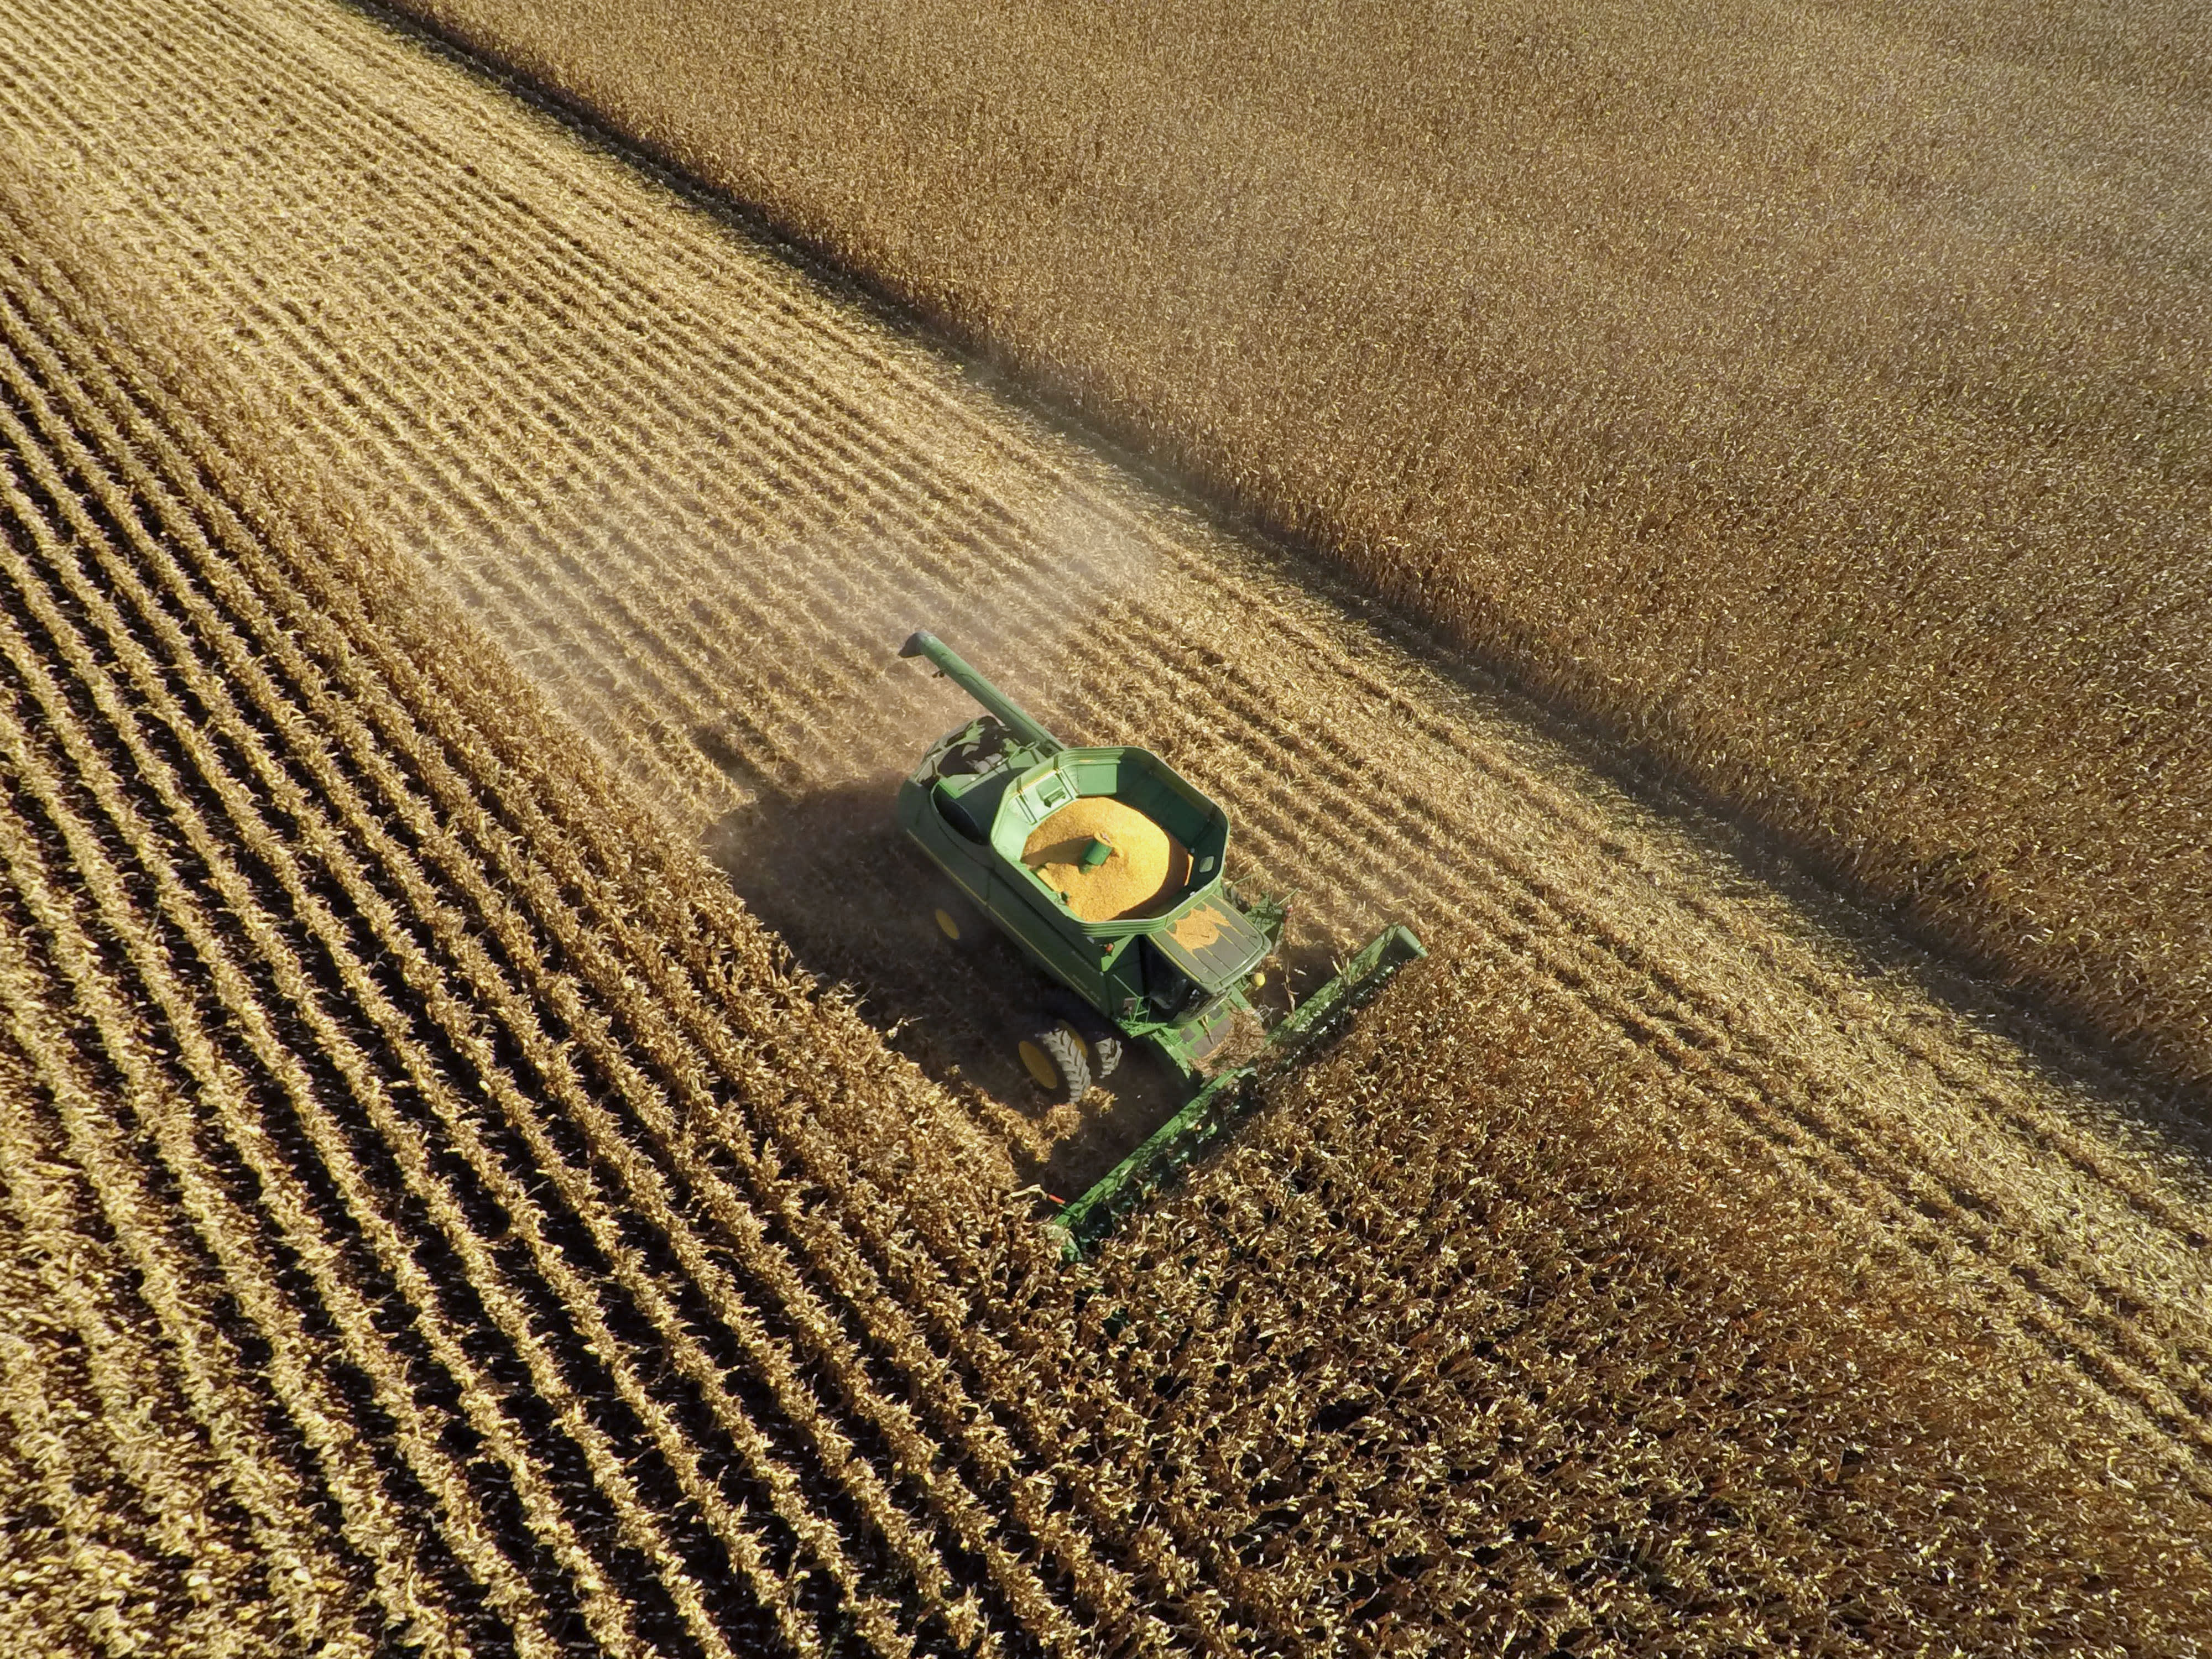 A way to match the billionaires buying up farmland buycottarizona